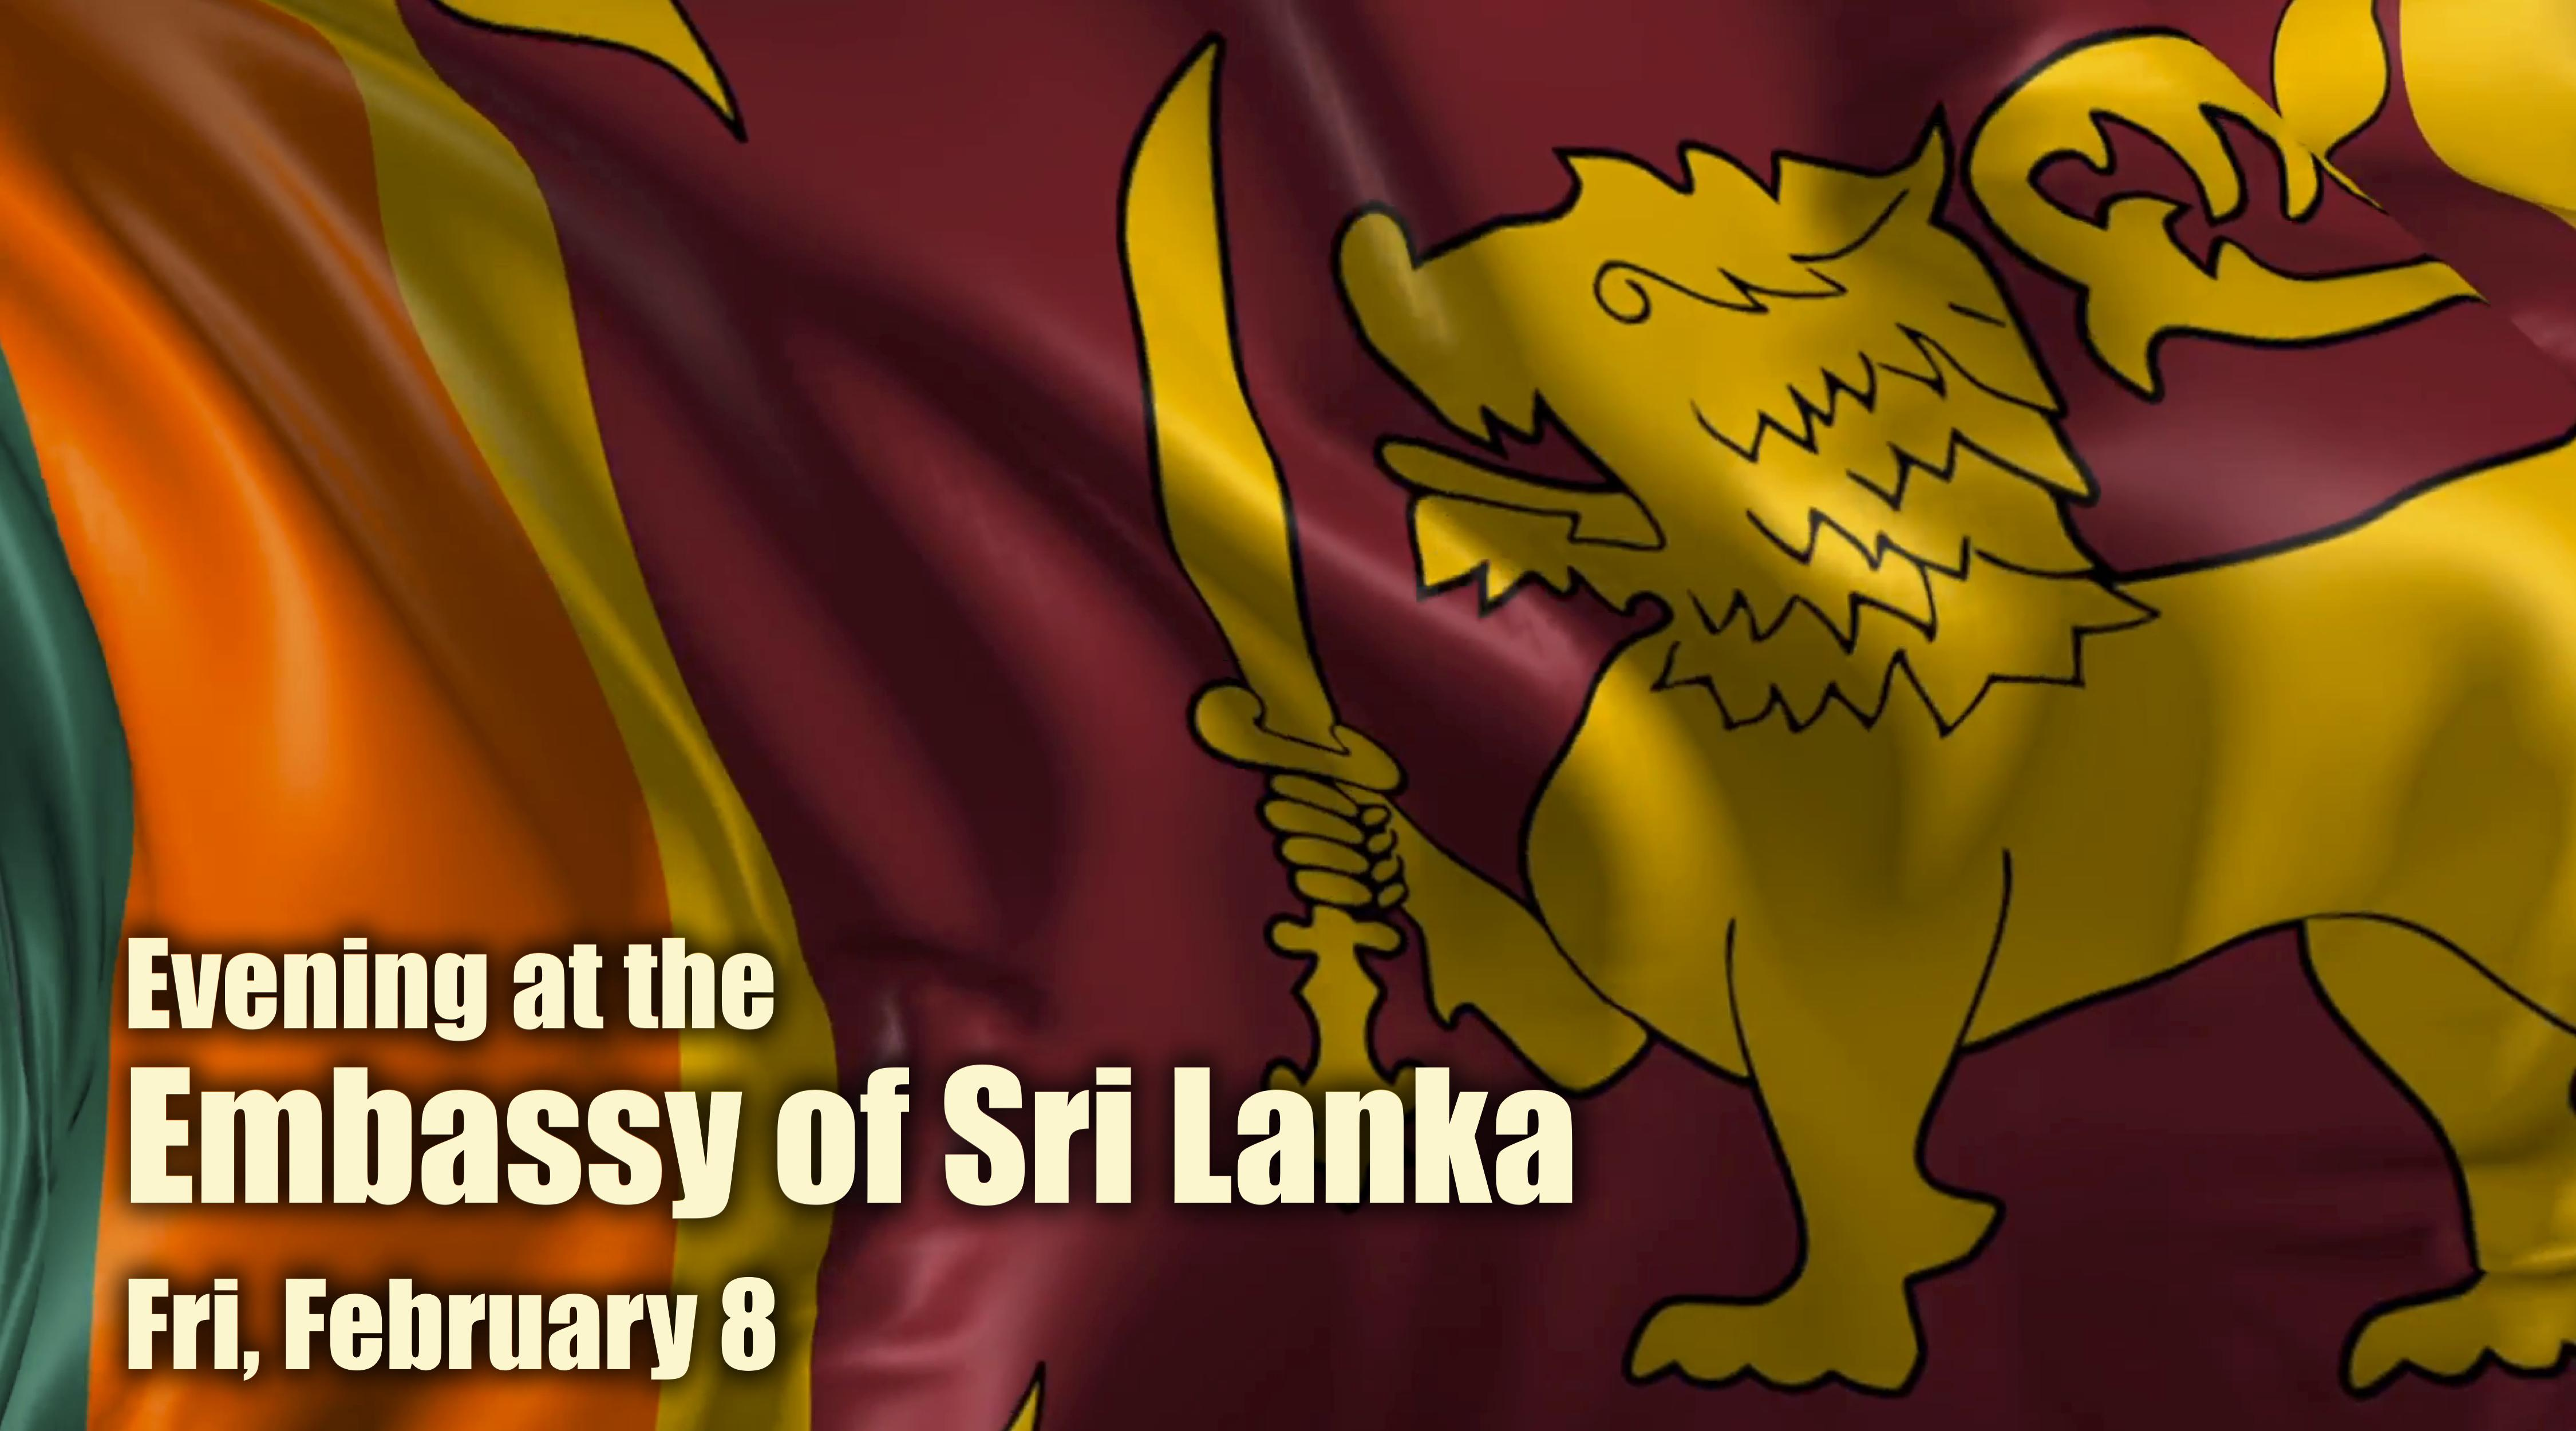 Evening at the Embassy of Sri Lanka